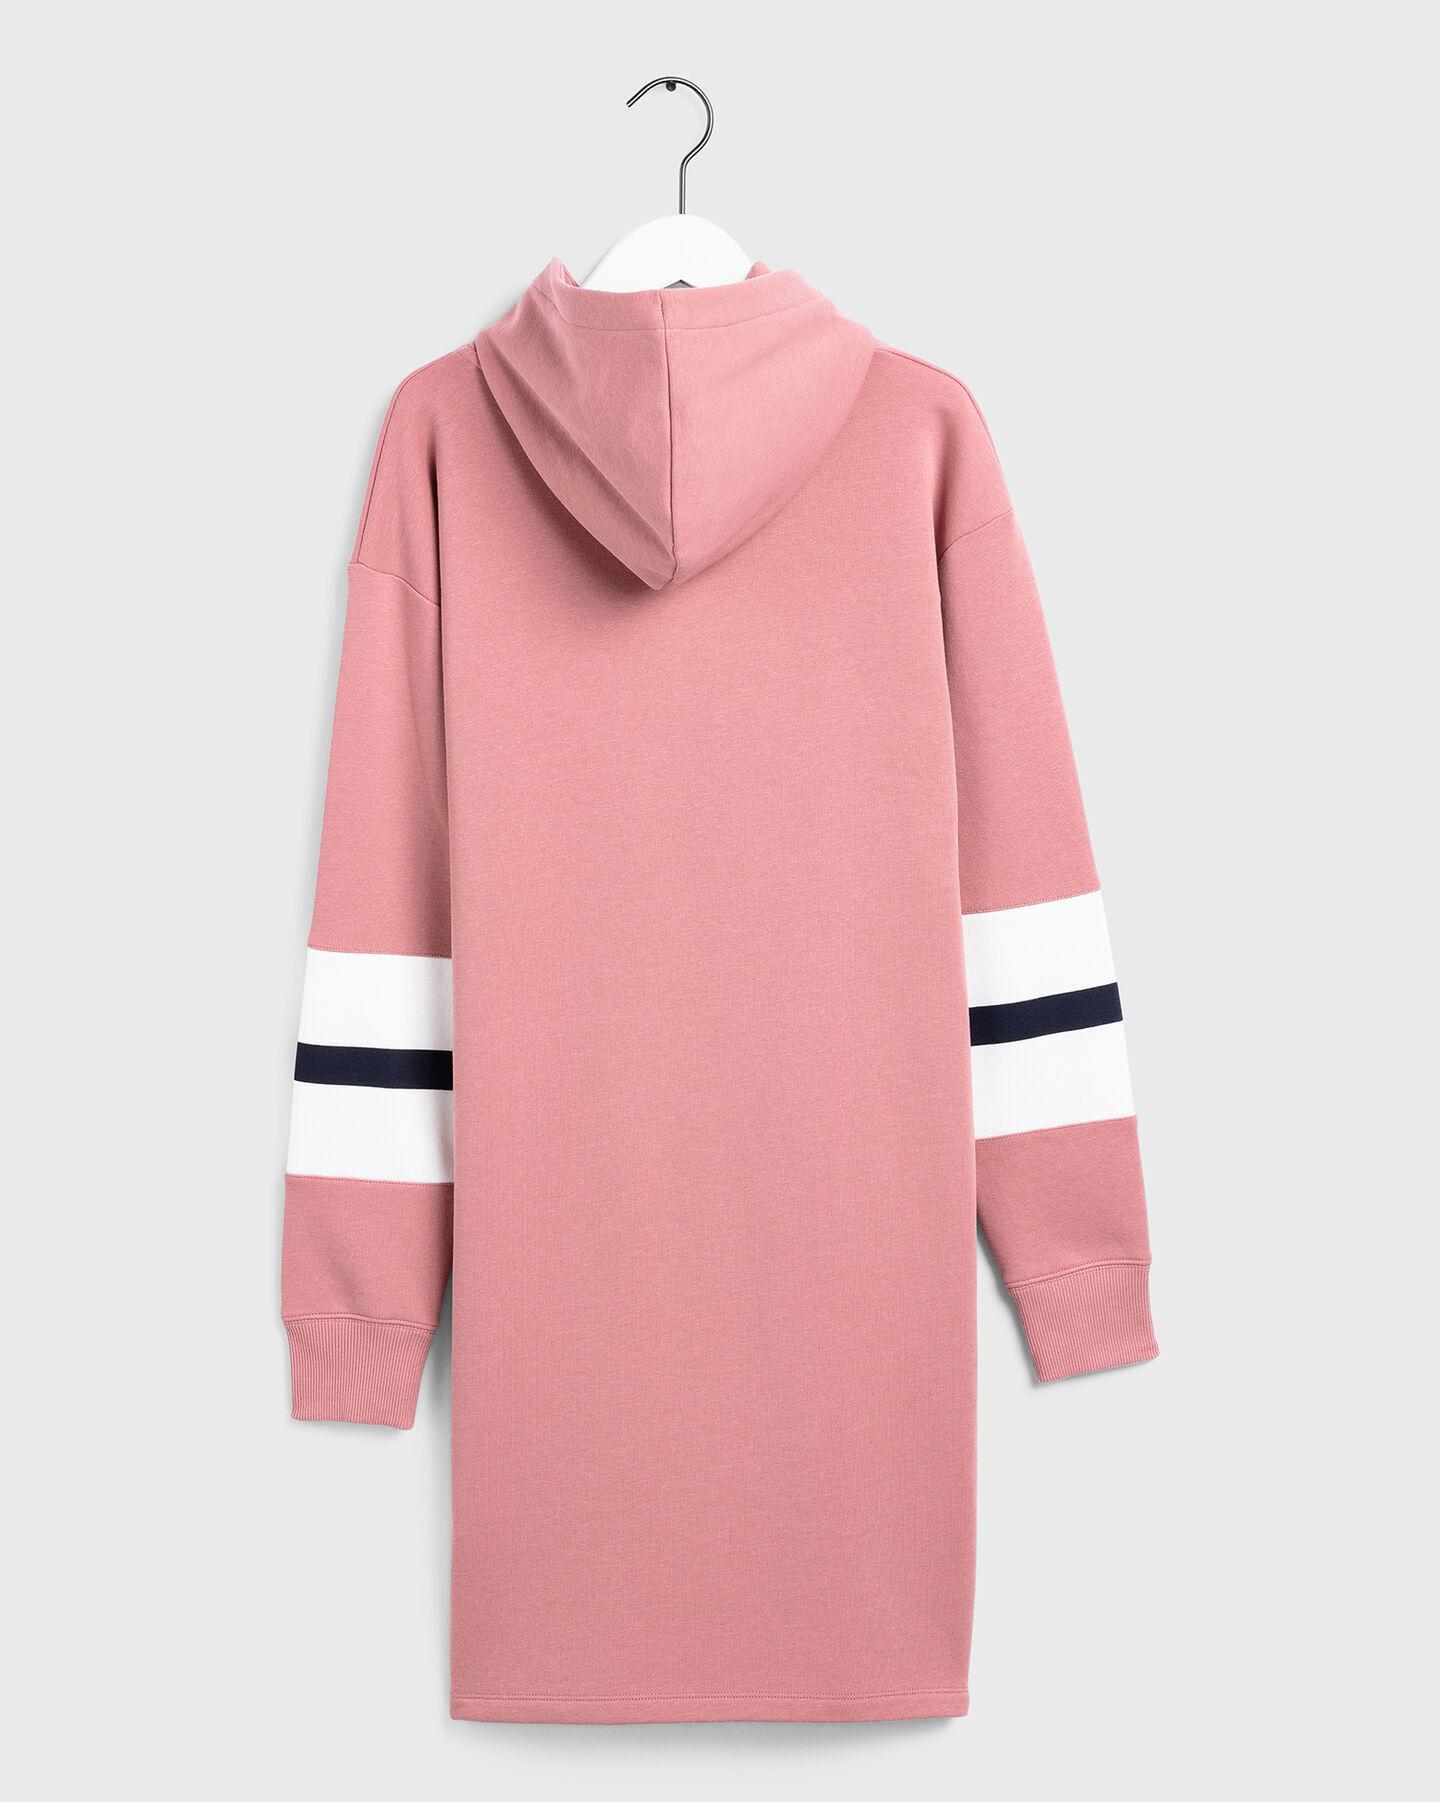 Graphic Block Stripe Kleid